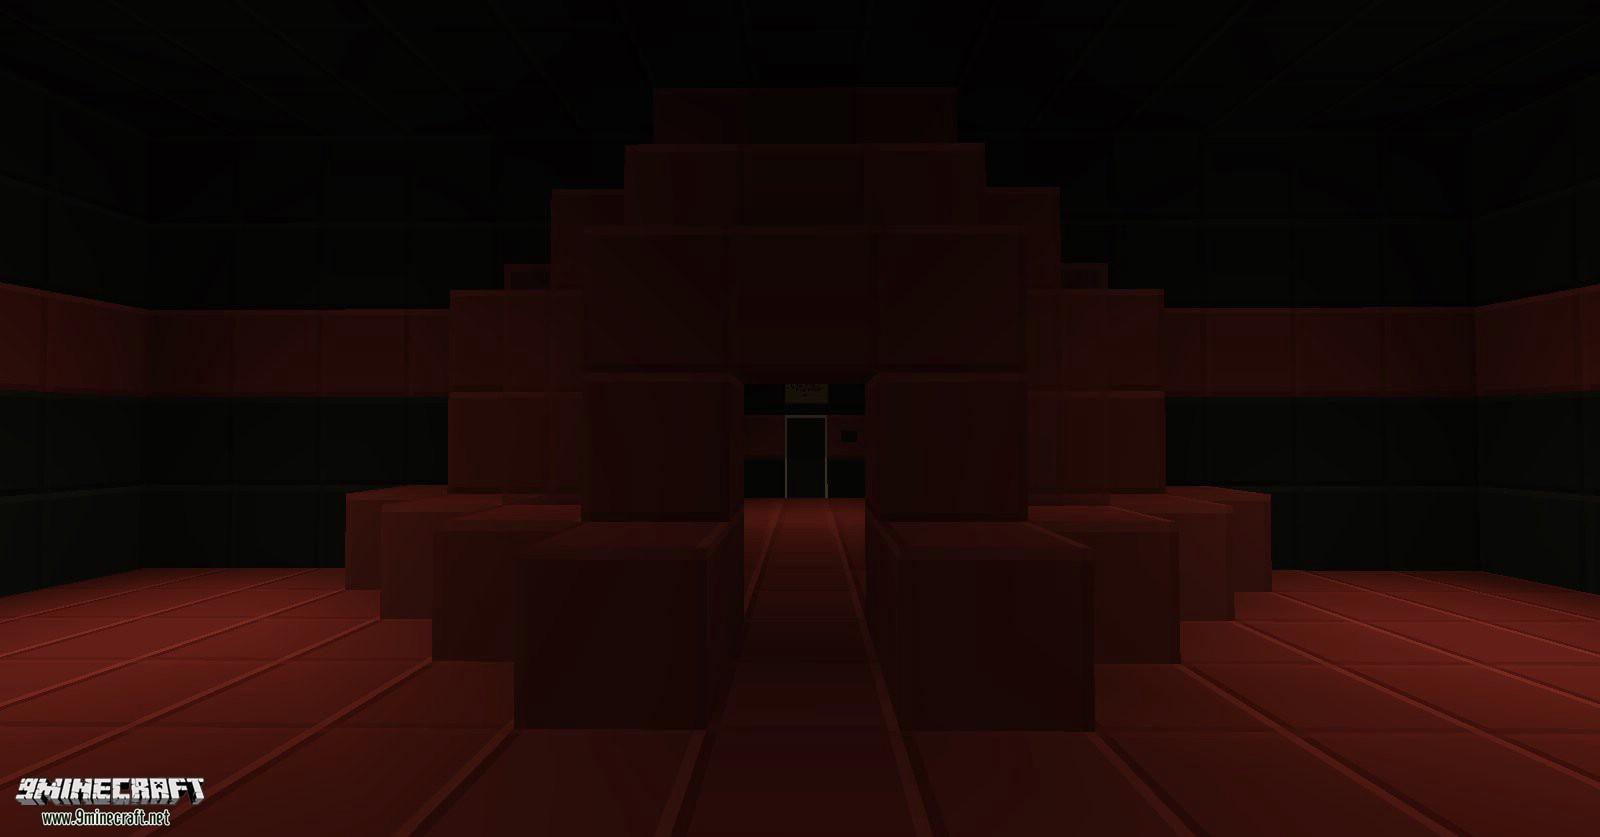 Laser-tag-capture-the-blocks-map-1.jpg